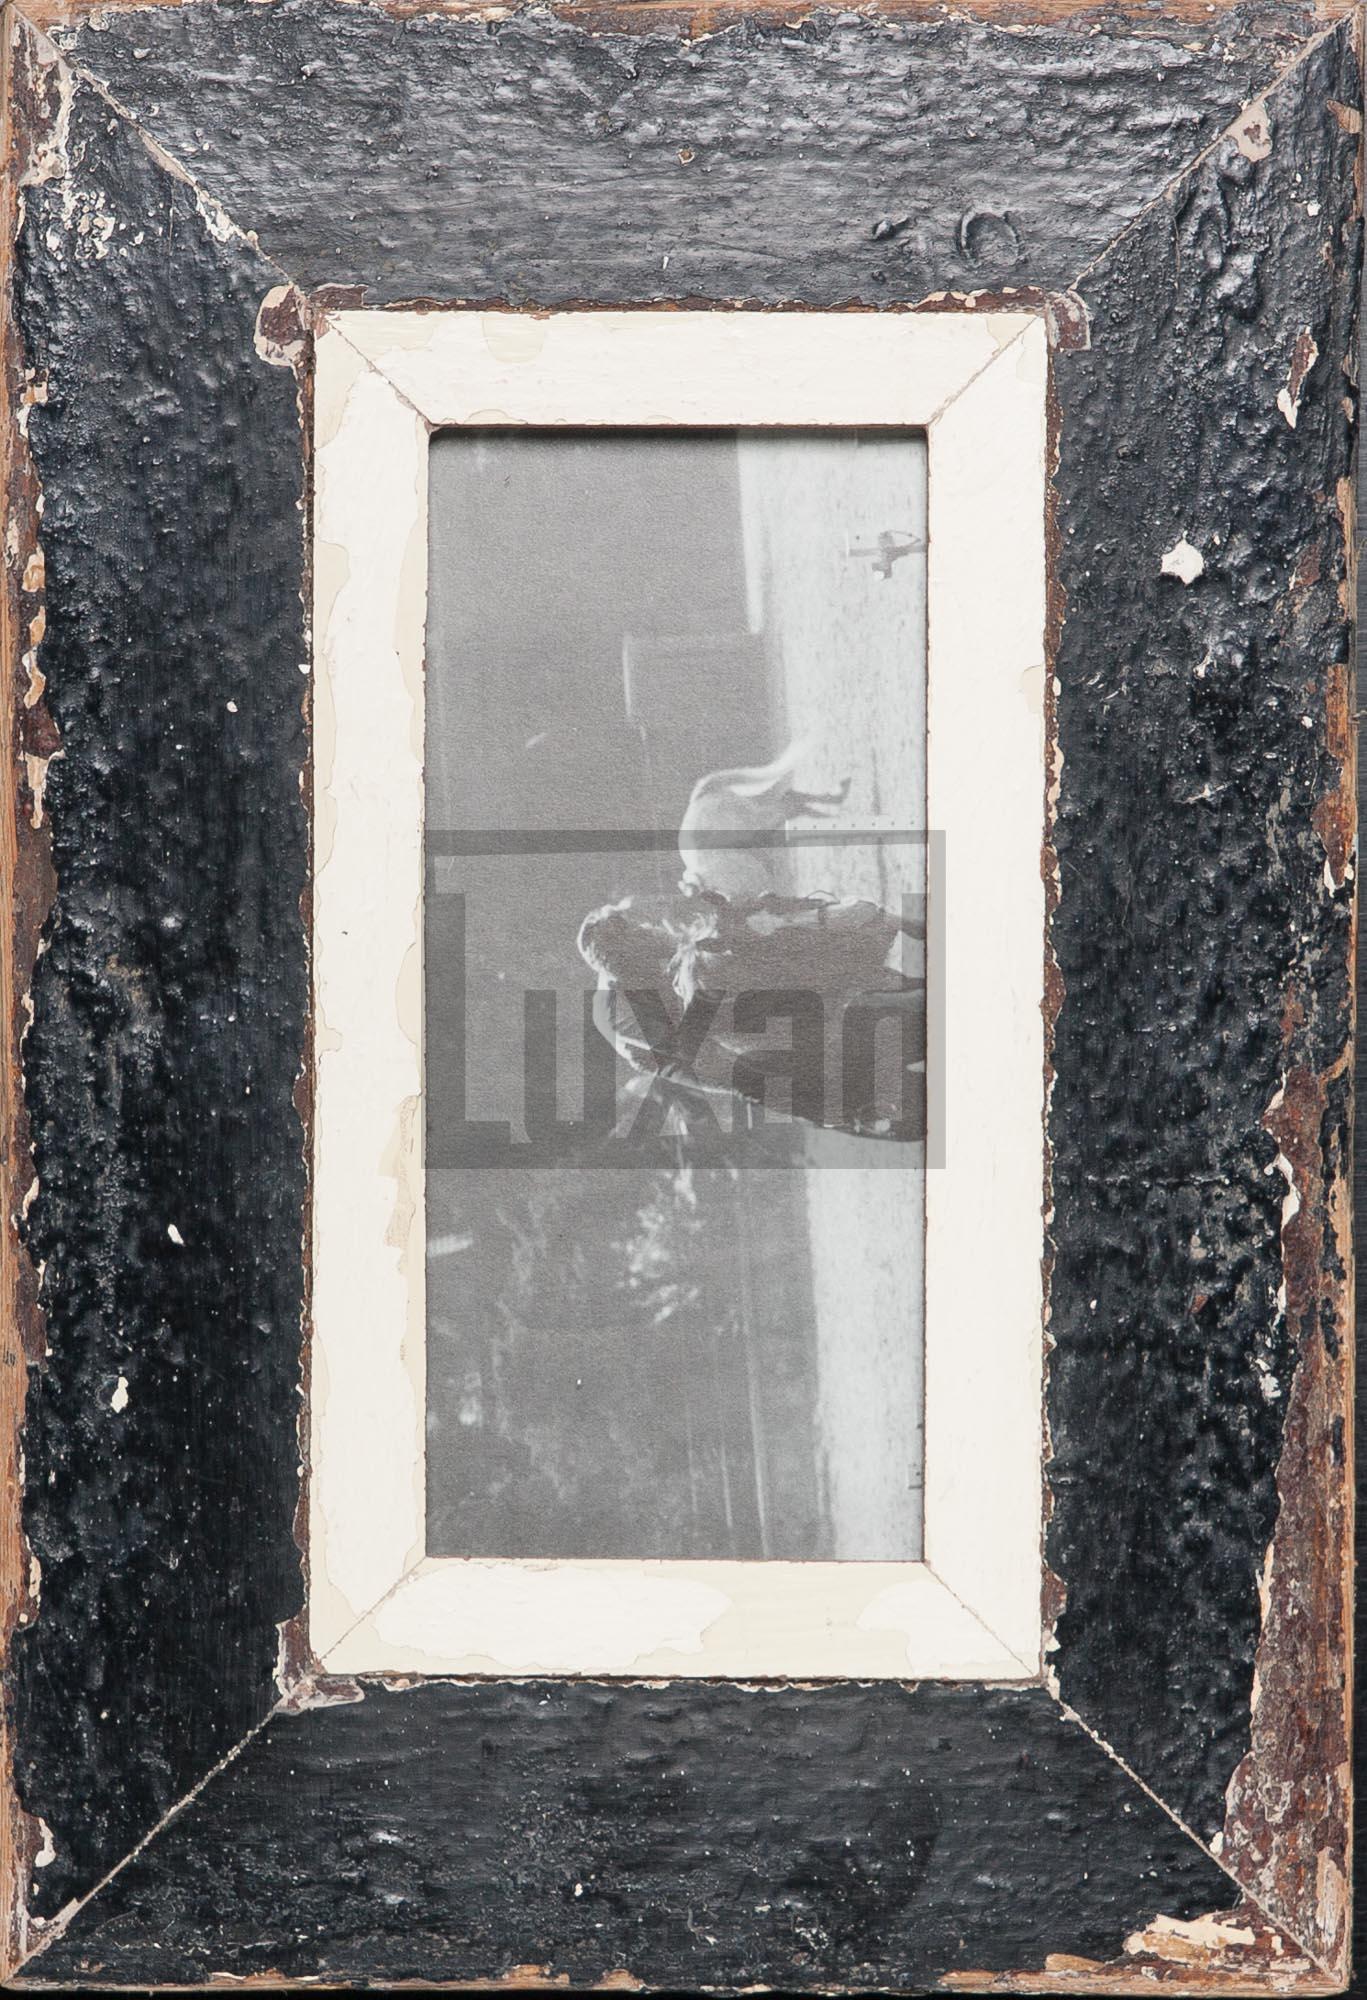 Panorama-Bilderrahmen aus altem Holz für Fotos ca. 10,5 x 29,7 cm